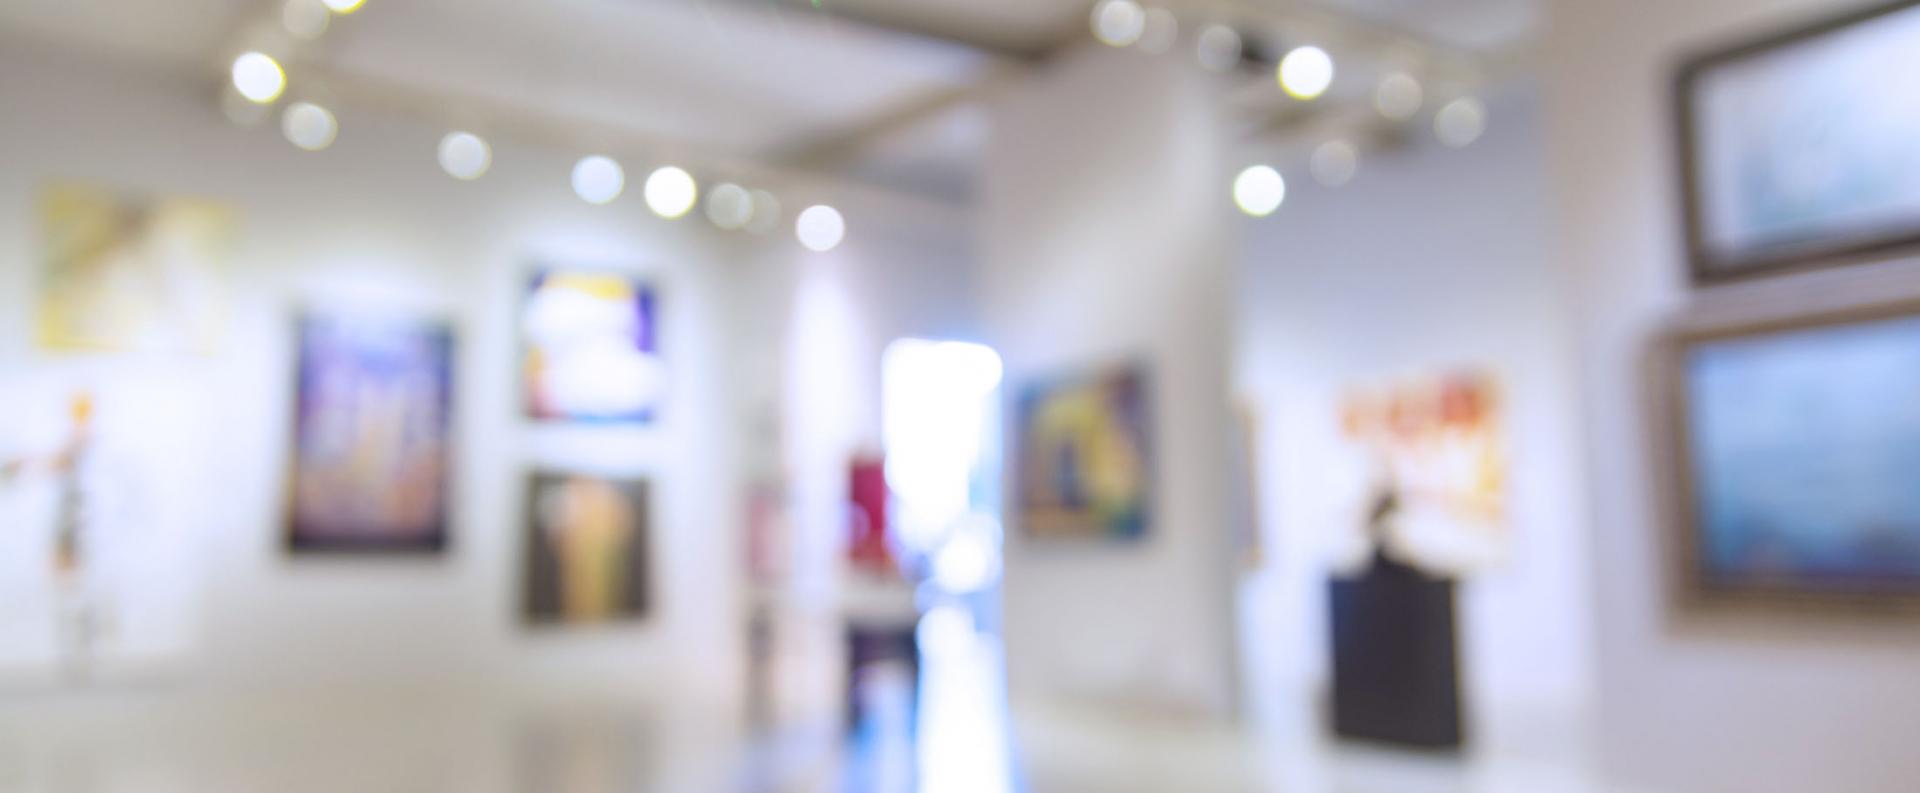 Abstract Blur Defocus Background of Art Gallery Museum